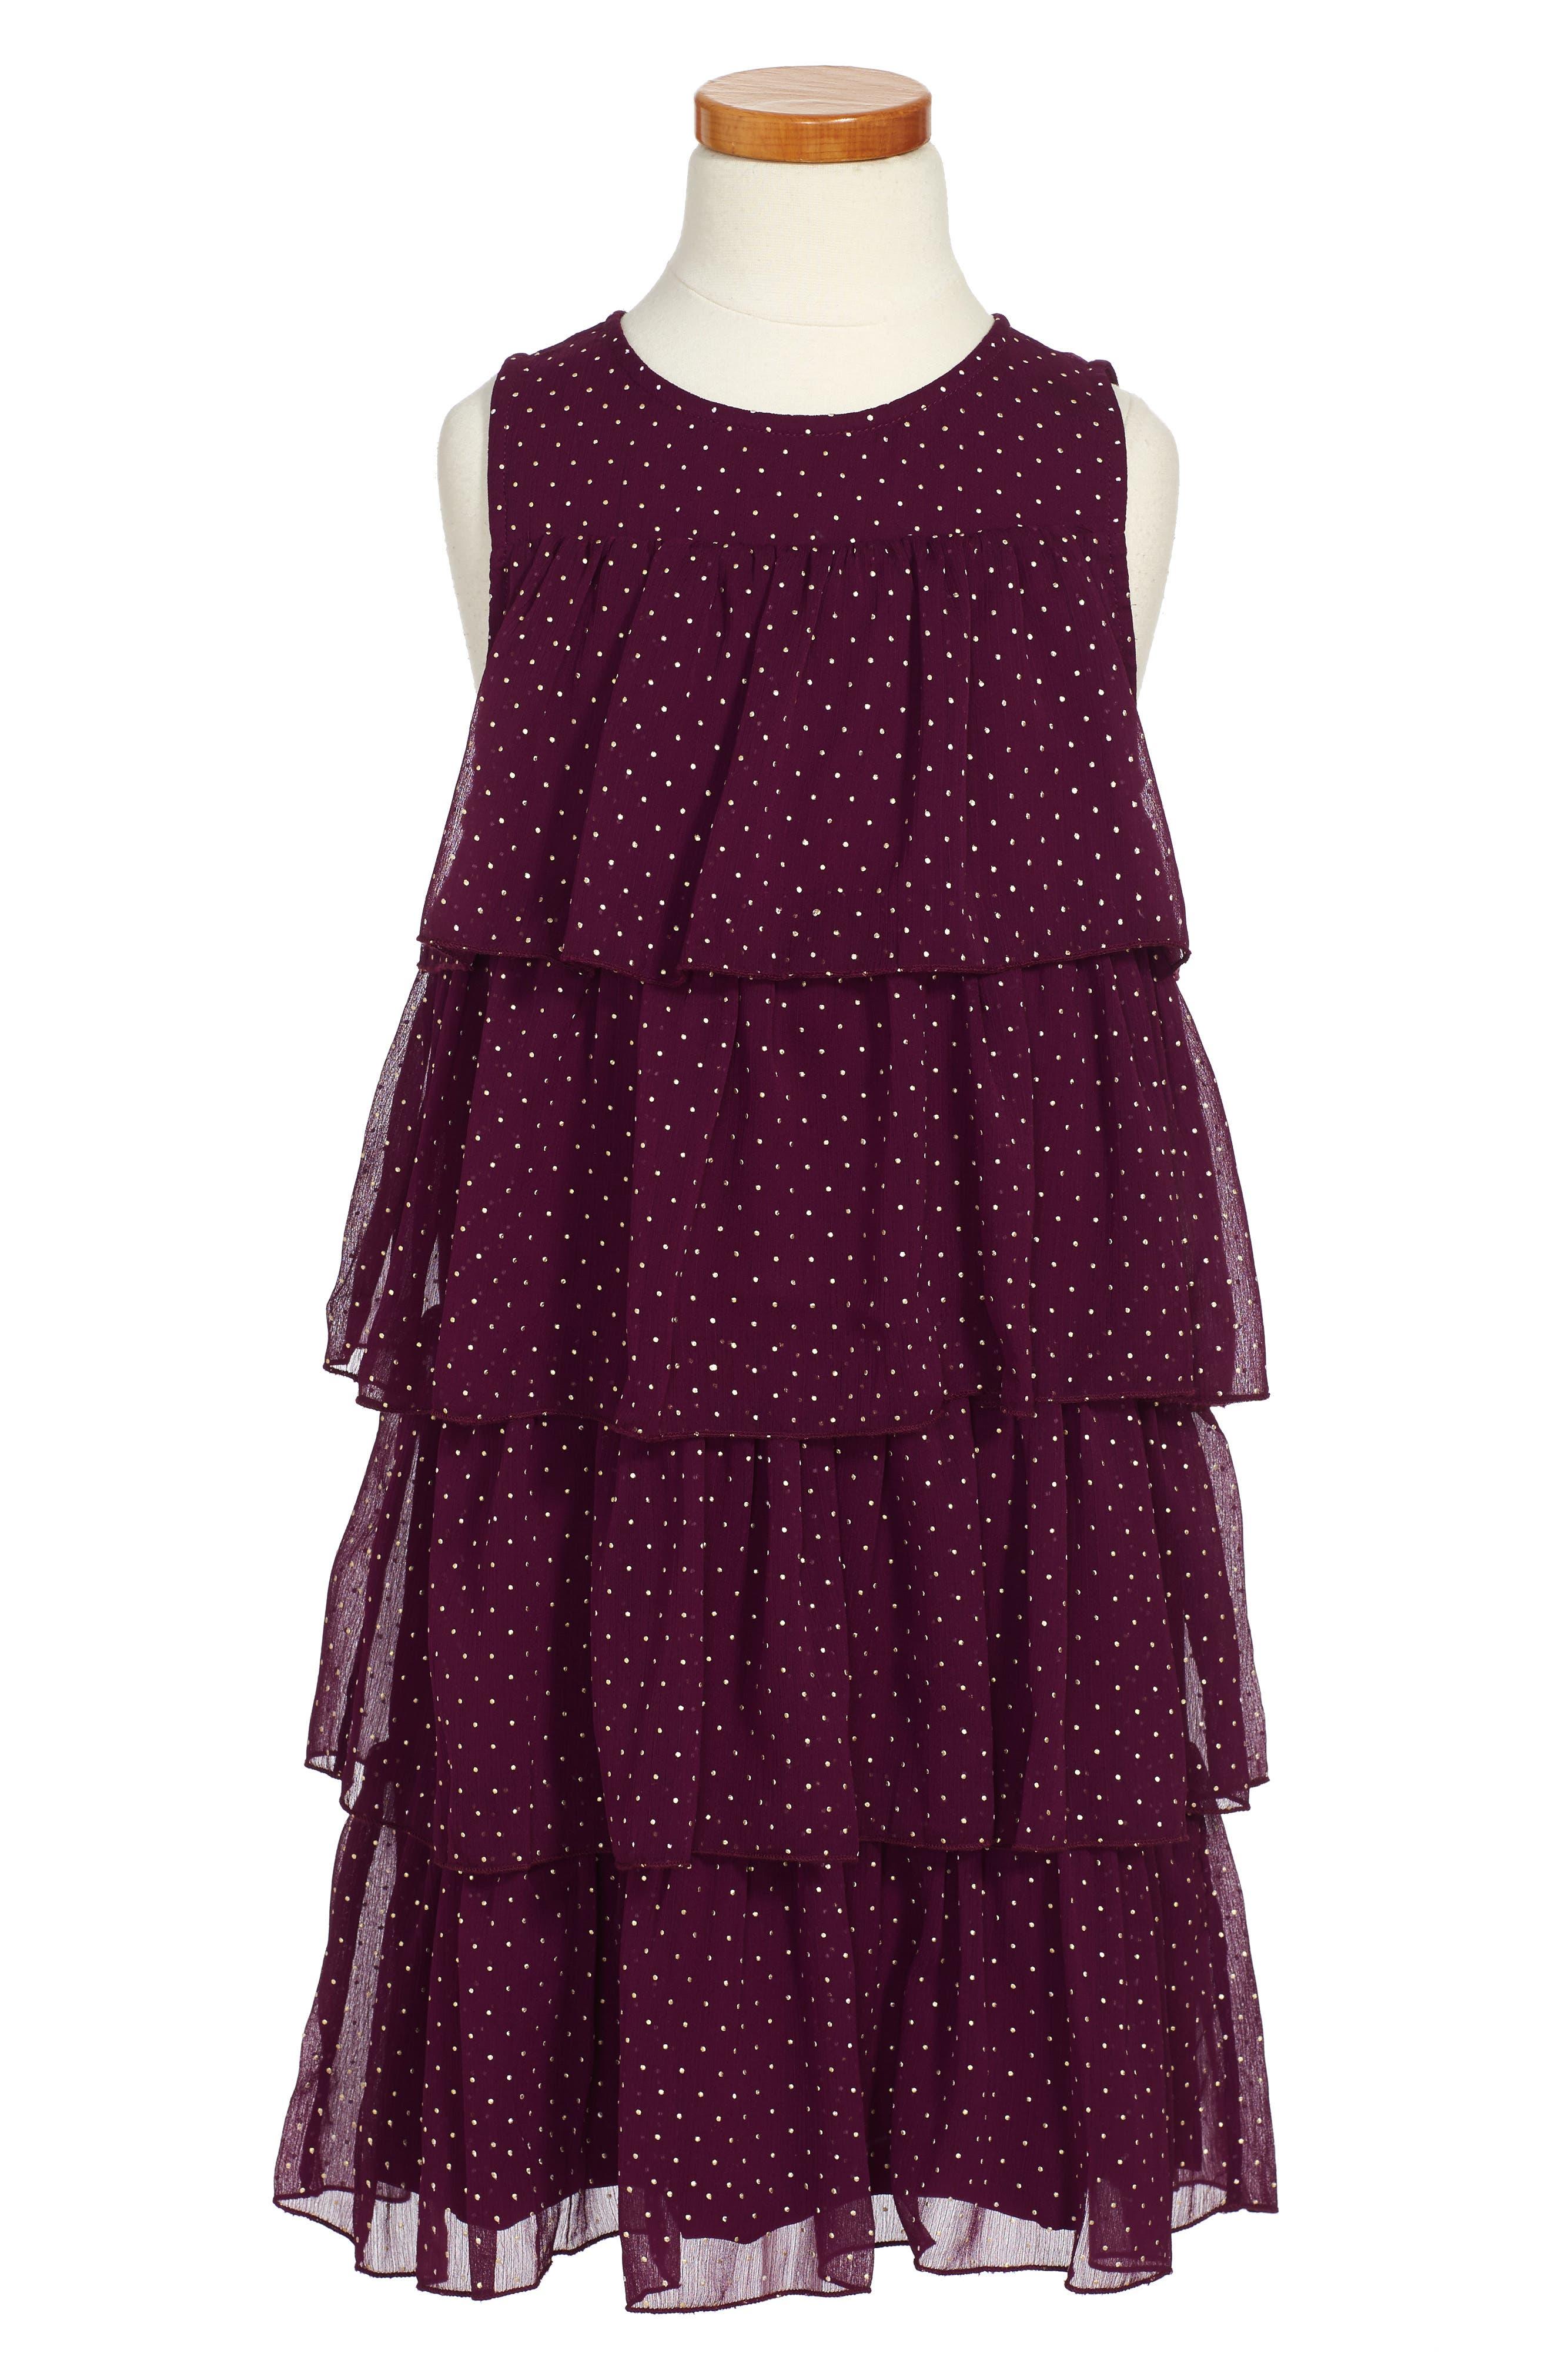 Main Image - Ruby & Bloom Tiered Dot Dress (Toddler Girls, Little Girls & Big Girls)